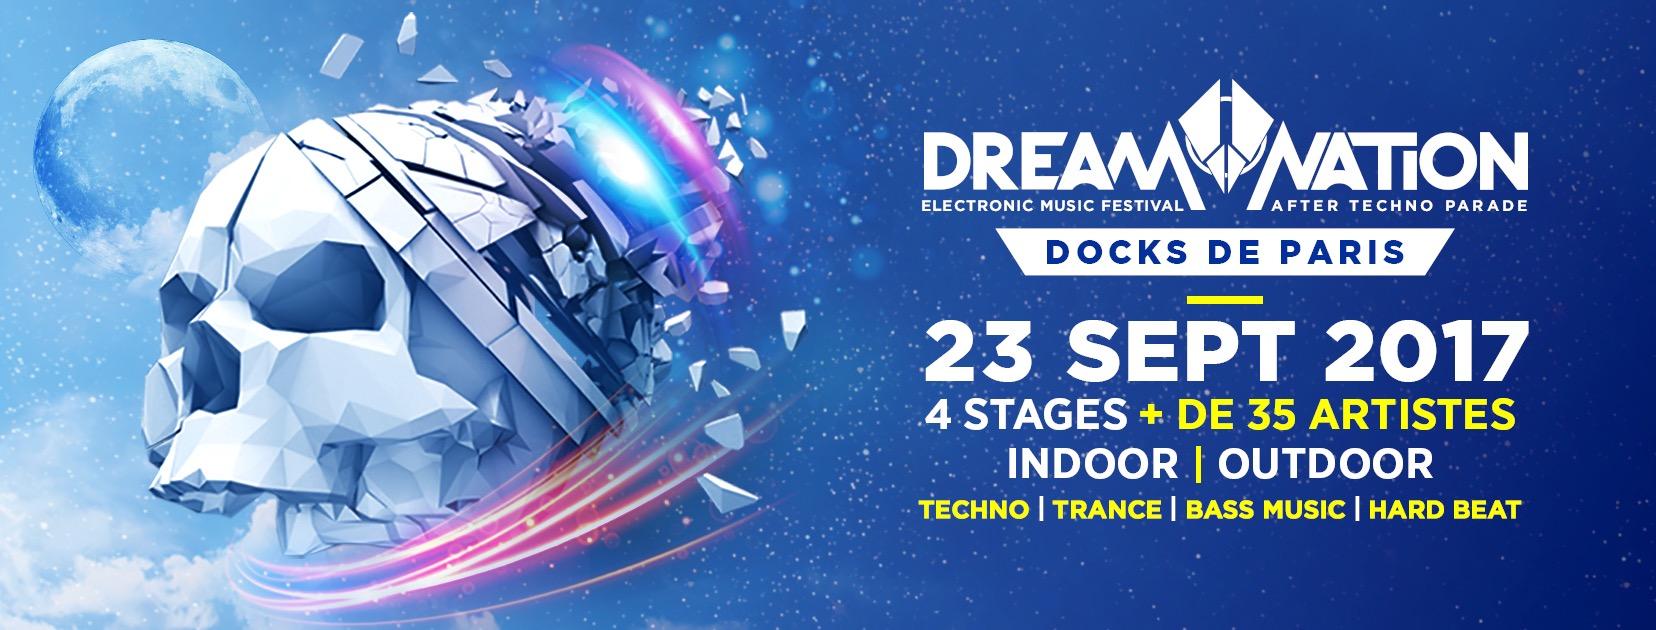 dream nation 2017